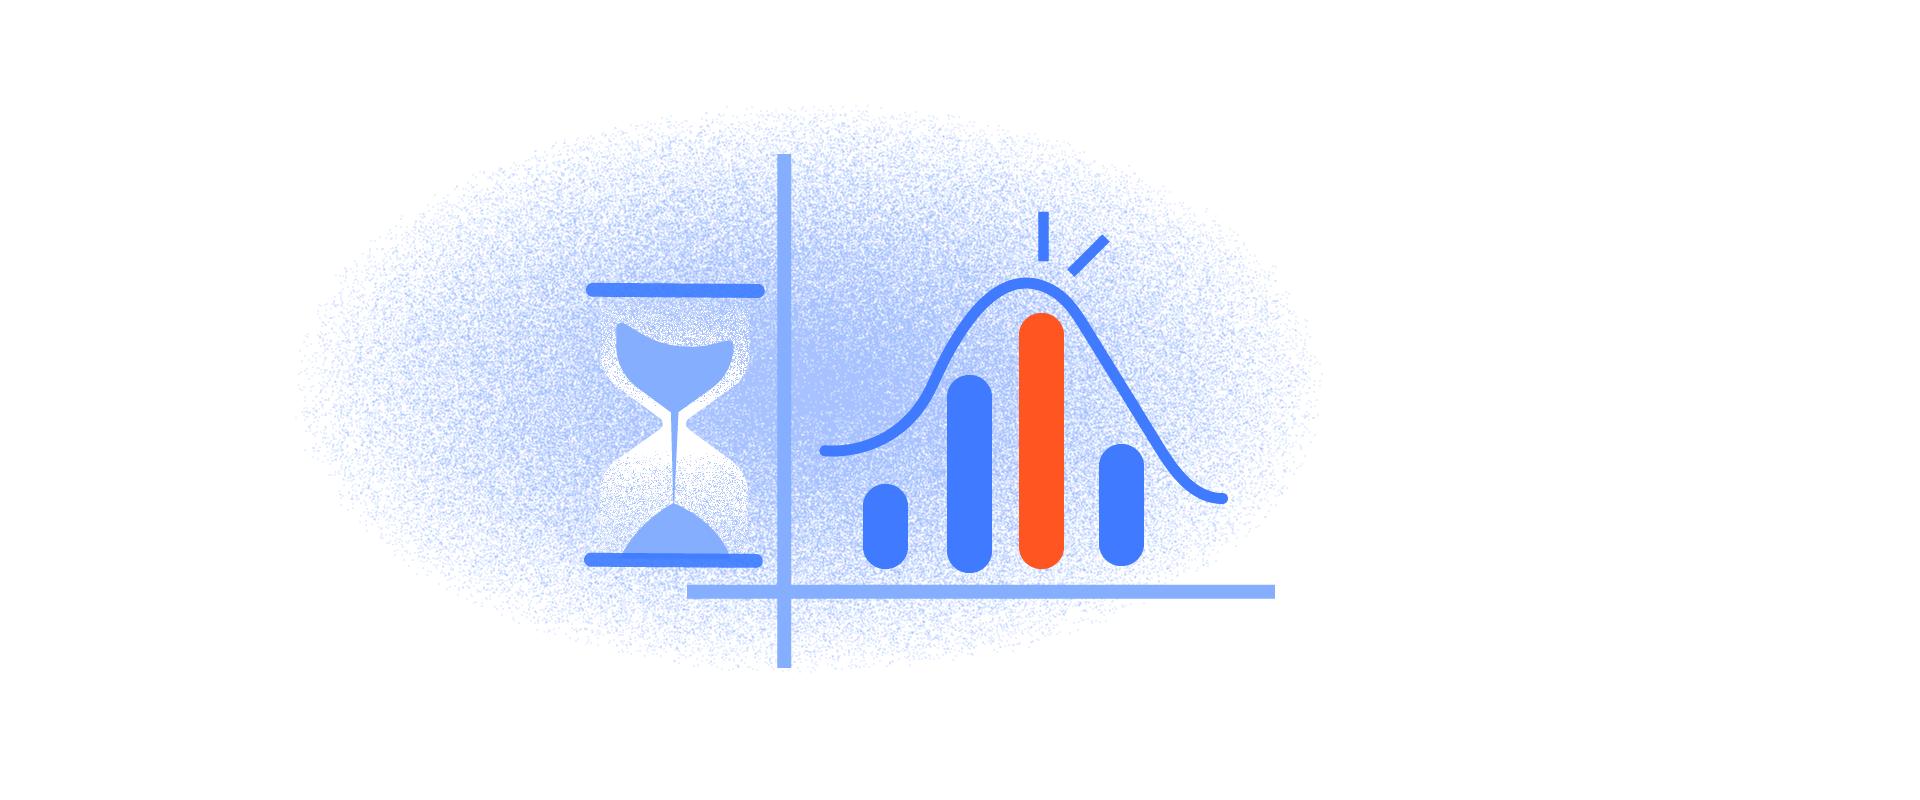 Peak business hours/season